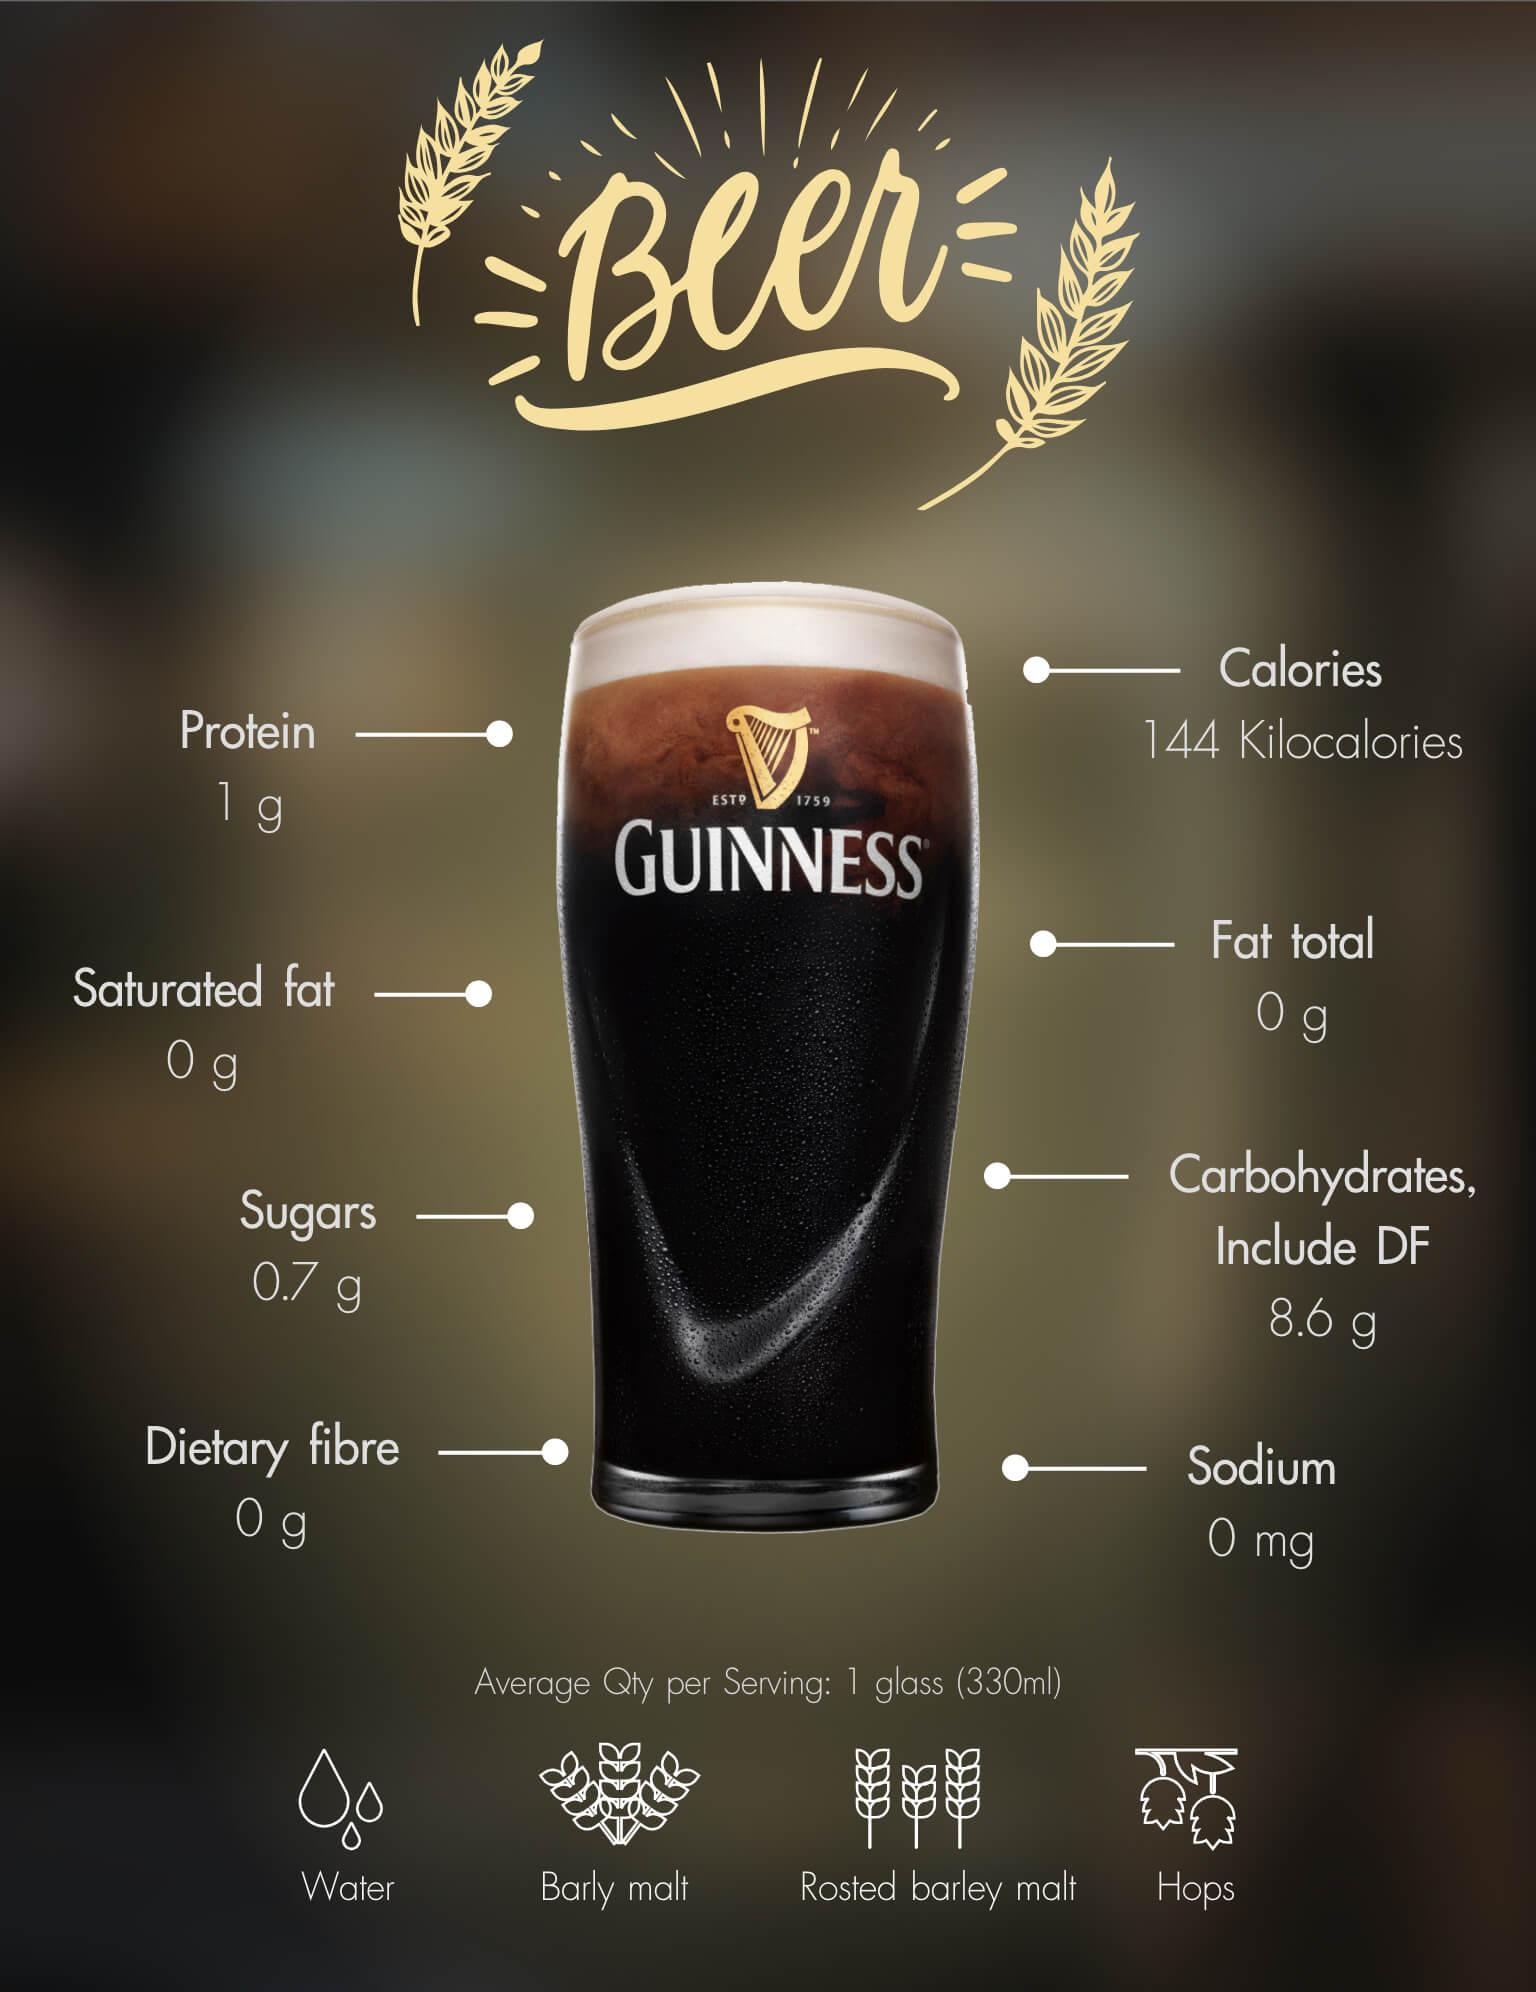 Guinness Premium Dark Beer Information